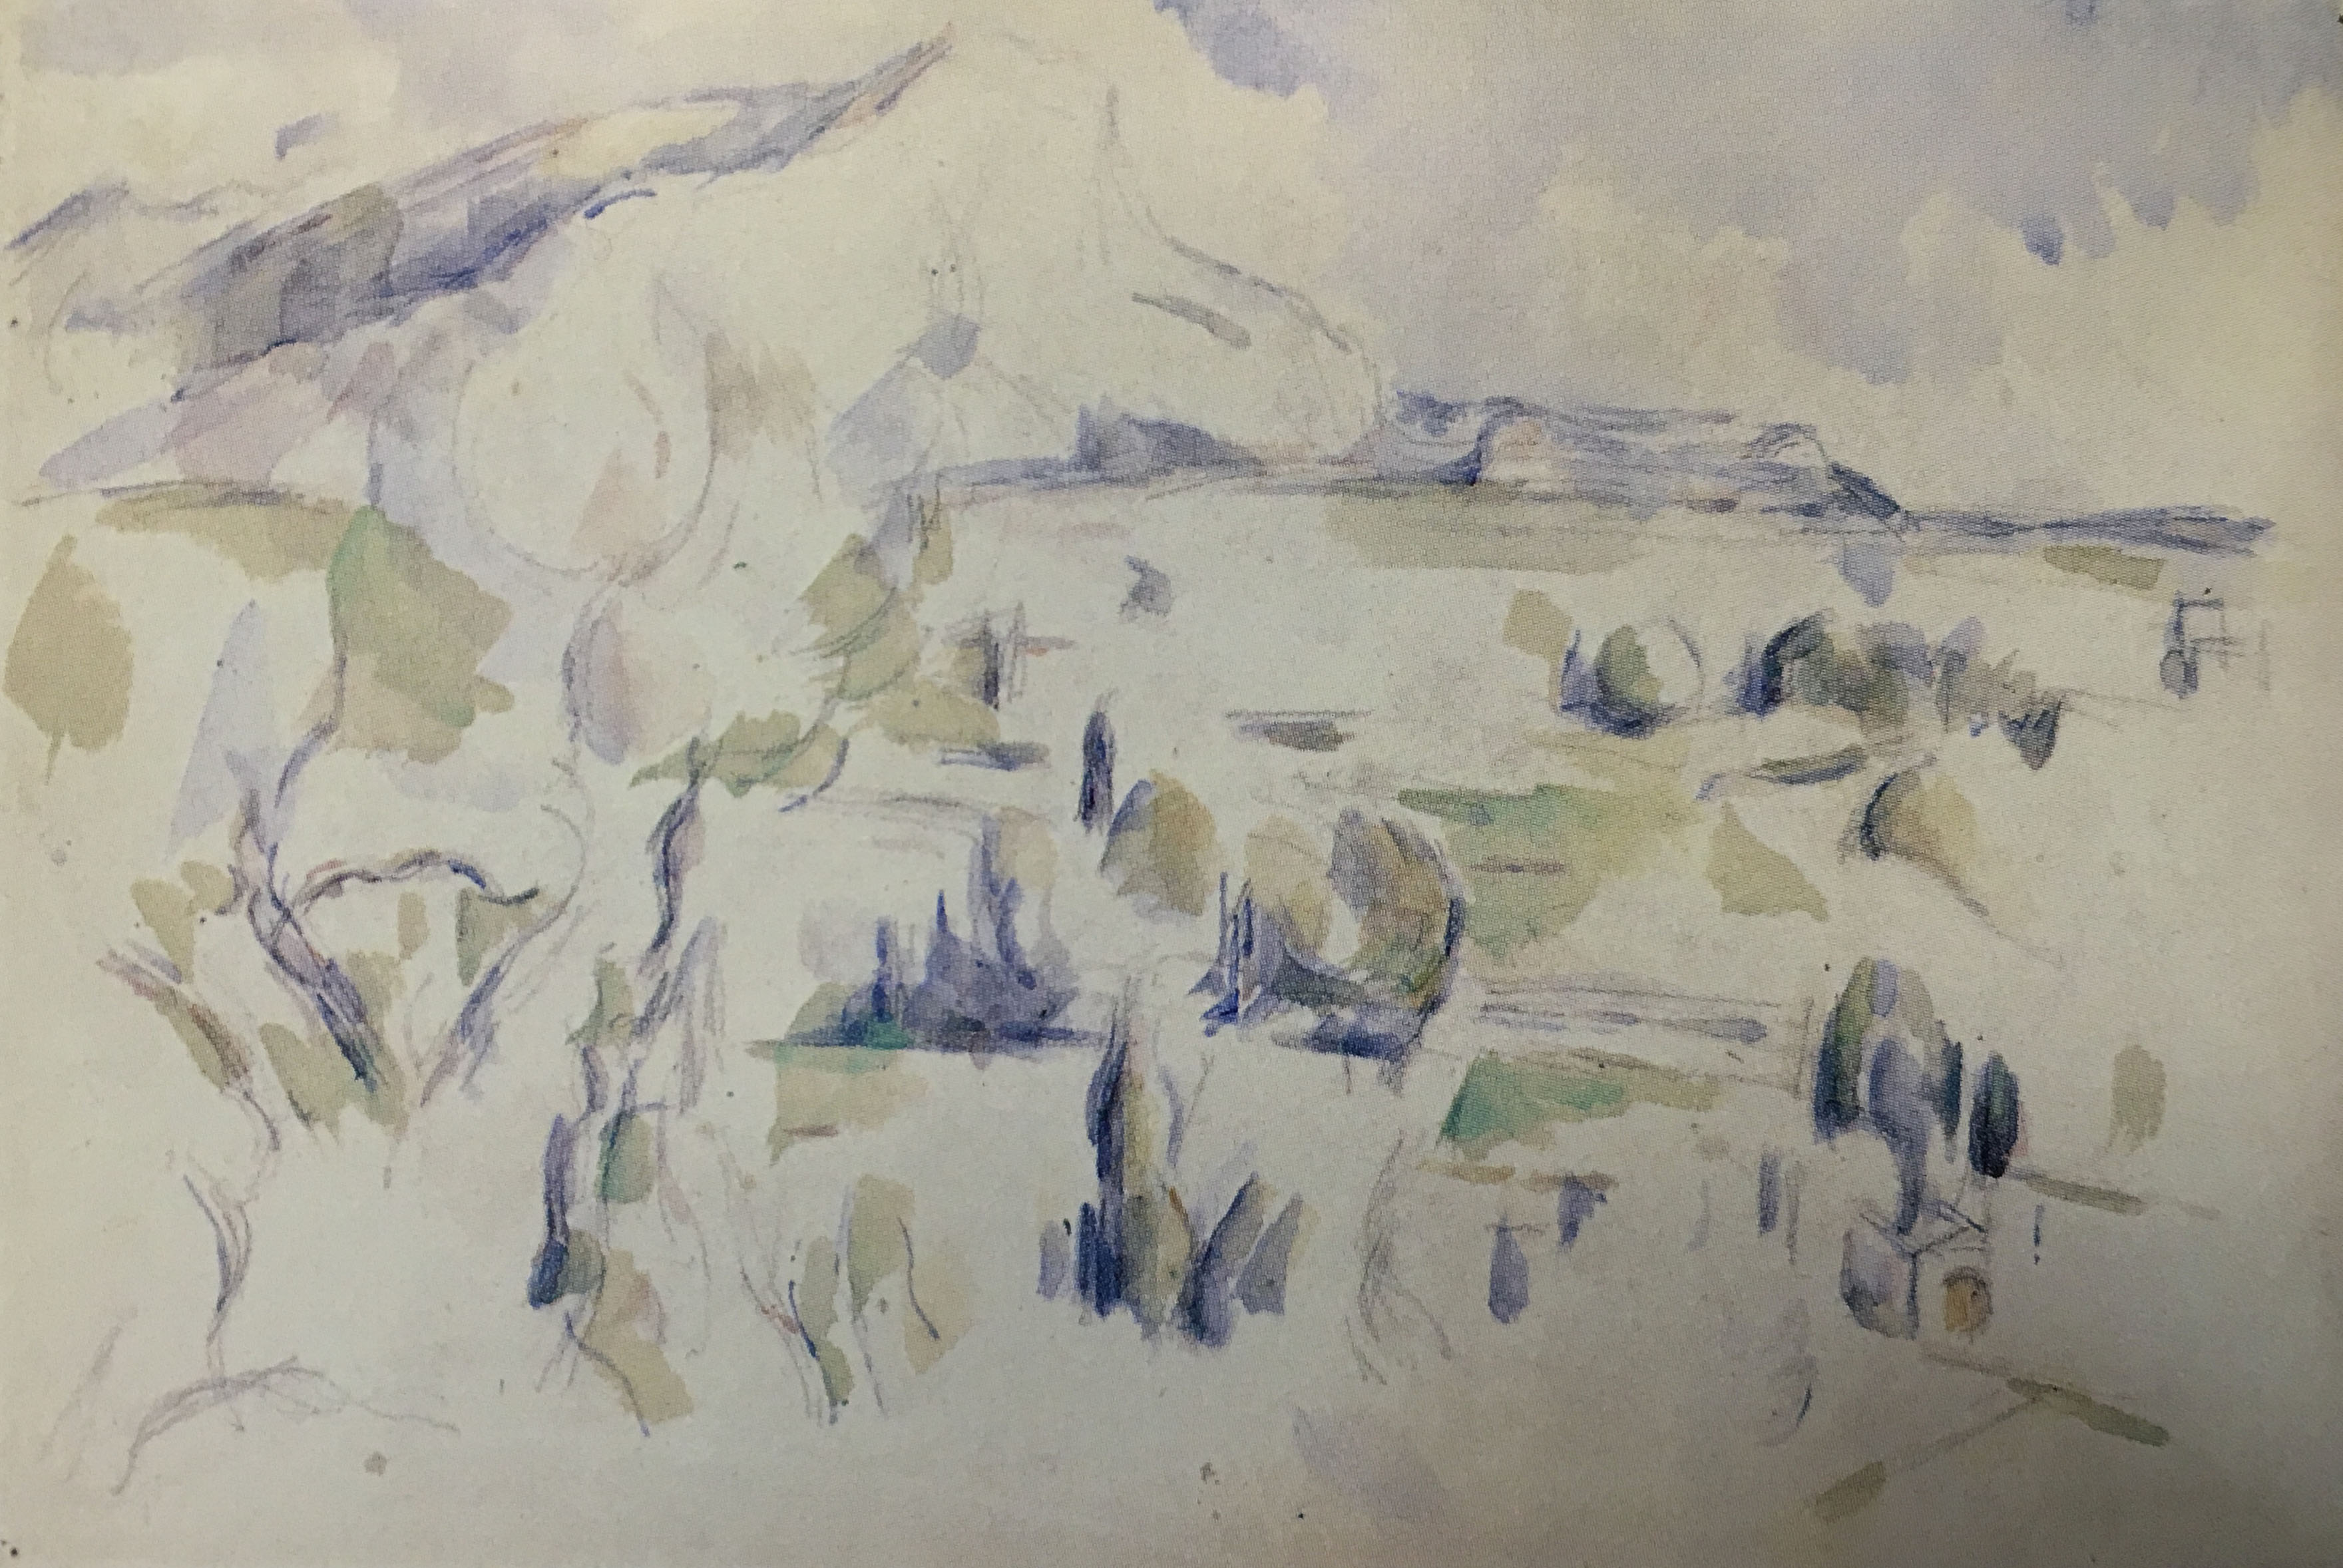 Сезанн Cezanne акварель Sainte Victoire пейзажи природы Альберт Сафиуллин